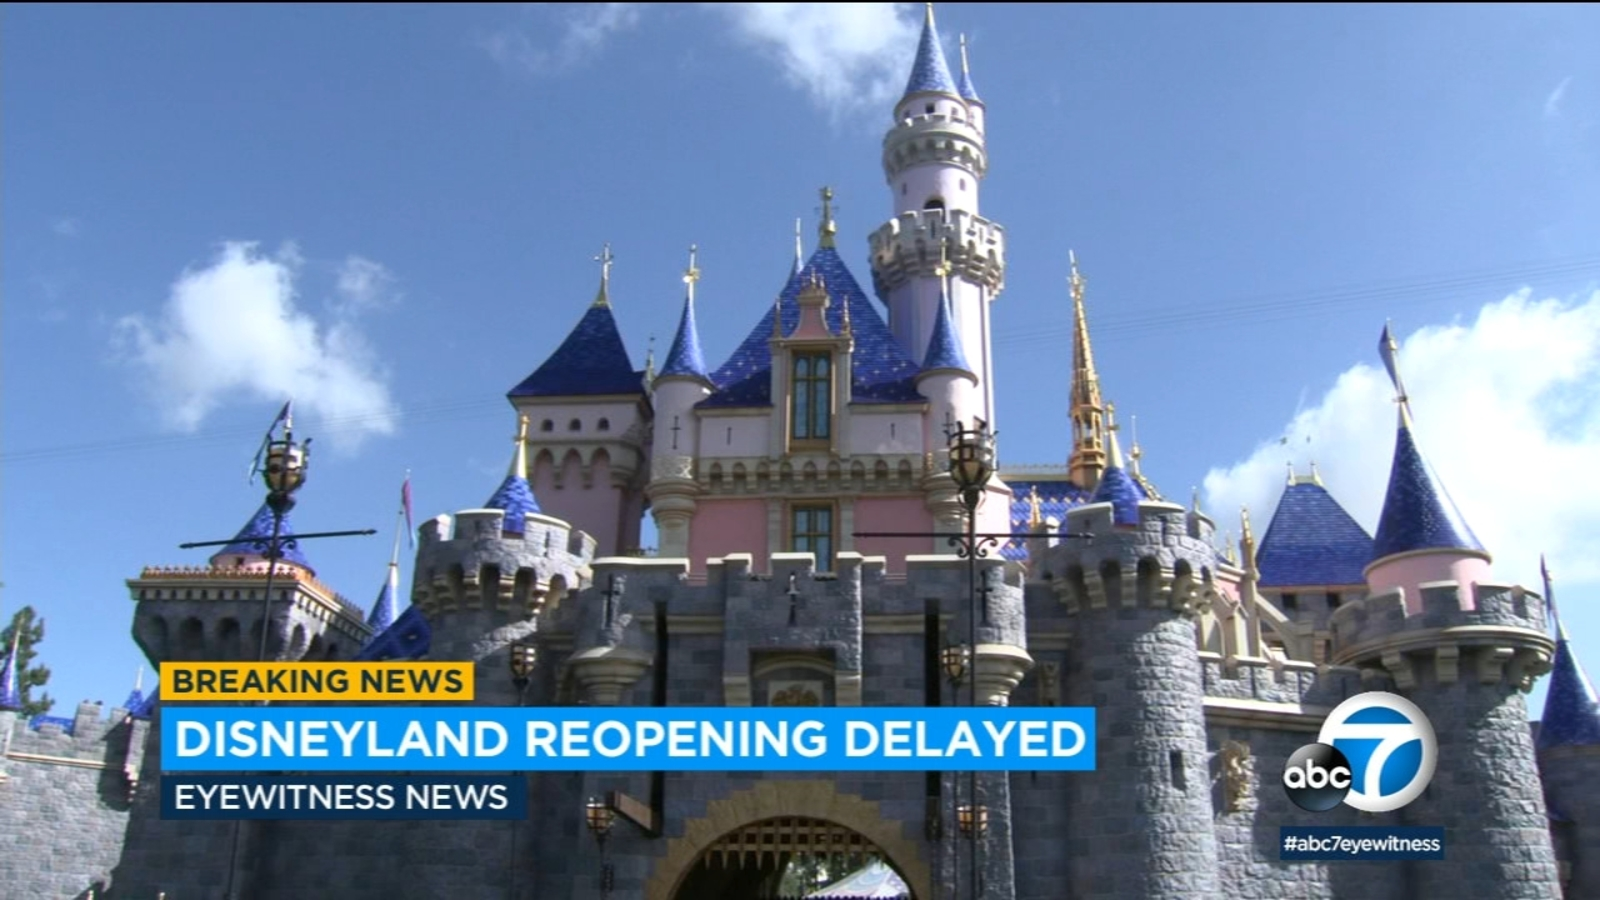 Disneyland Resort Delays Reopening Of Anaheim Theme Parks Amid Covid 19 Concerns Internewscast